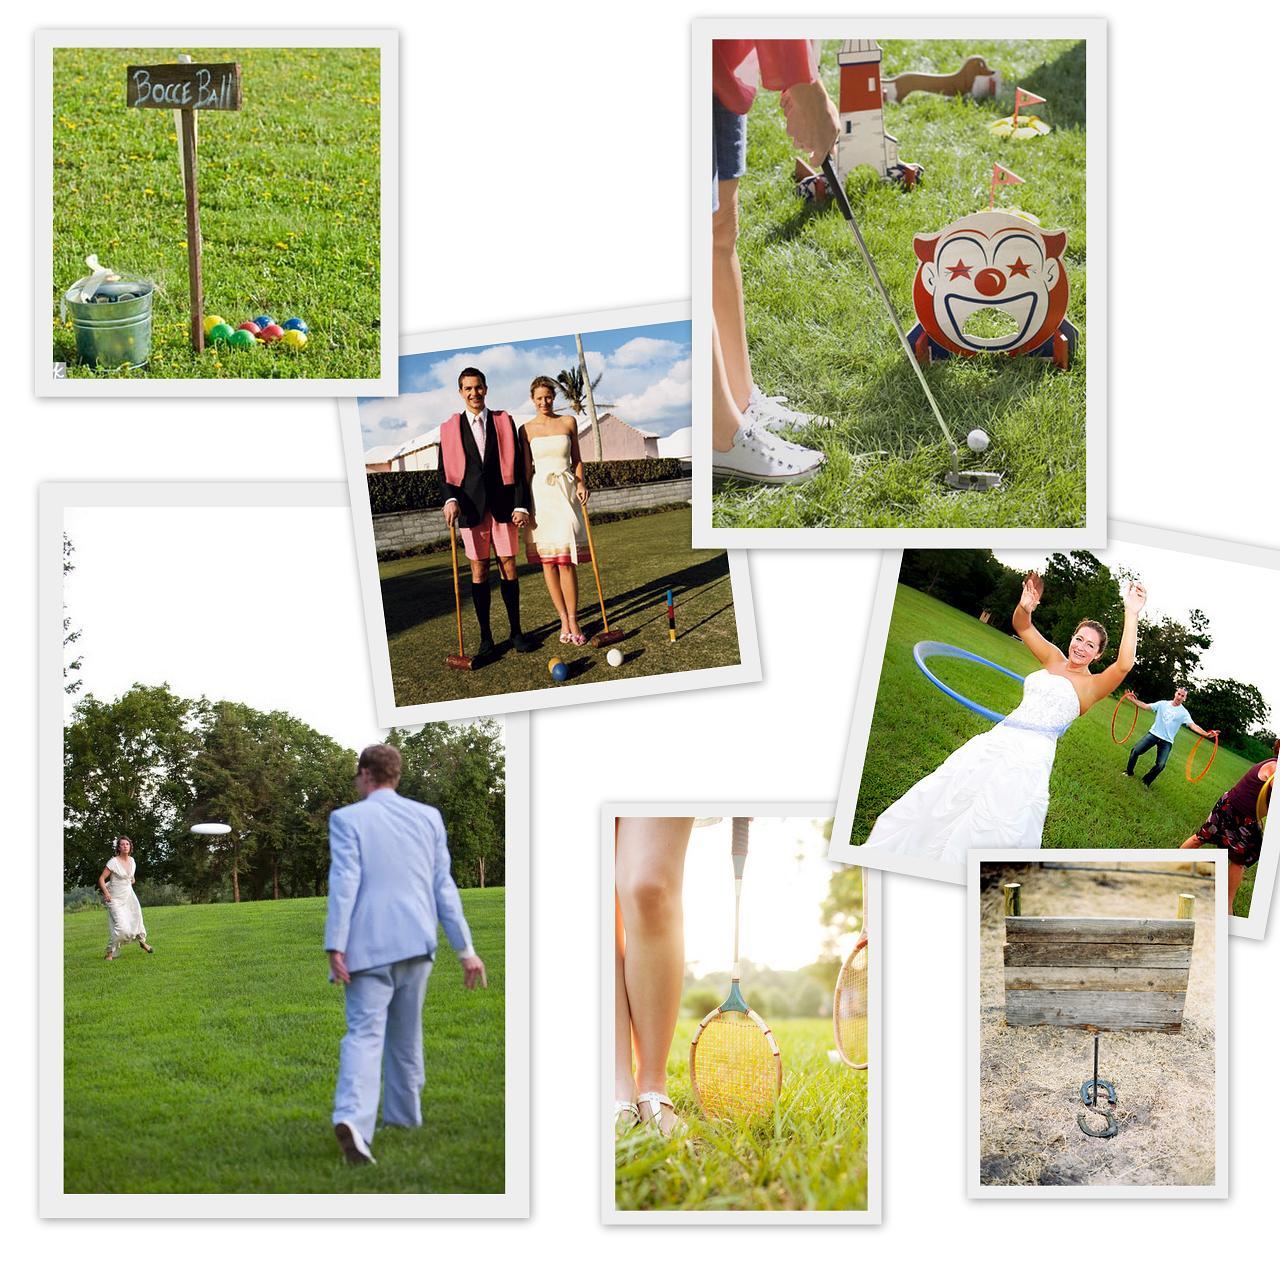 fun lawn games for outdoor weddings  OneWedcom